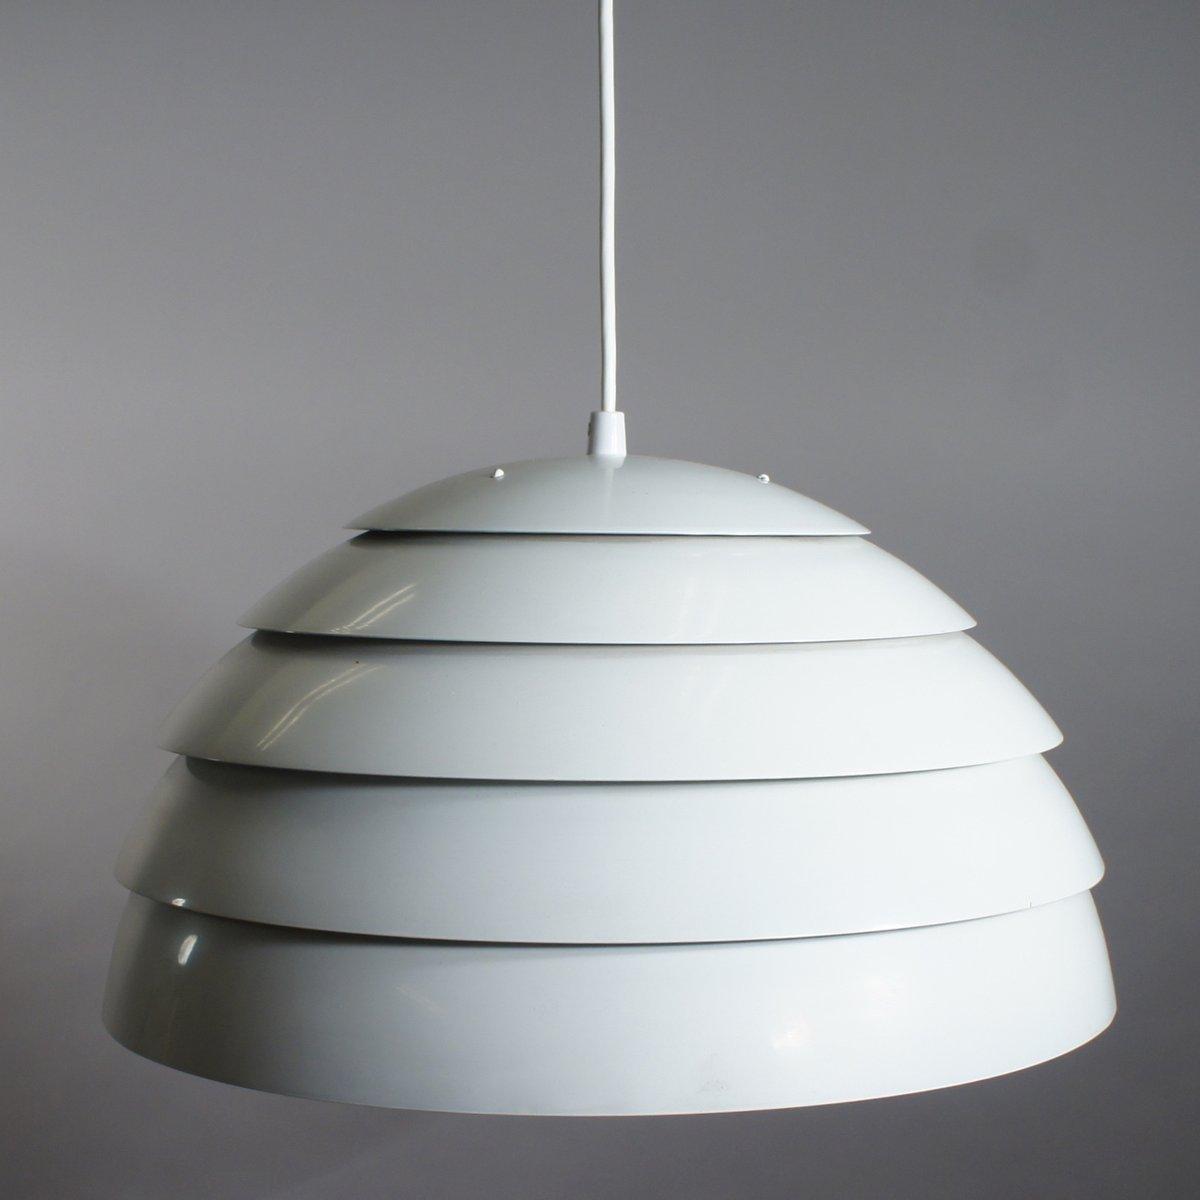 Scandinavian Light Fixtures Vintage Scandinavian Ceiling Lamphansagne Jakobsson For Sale